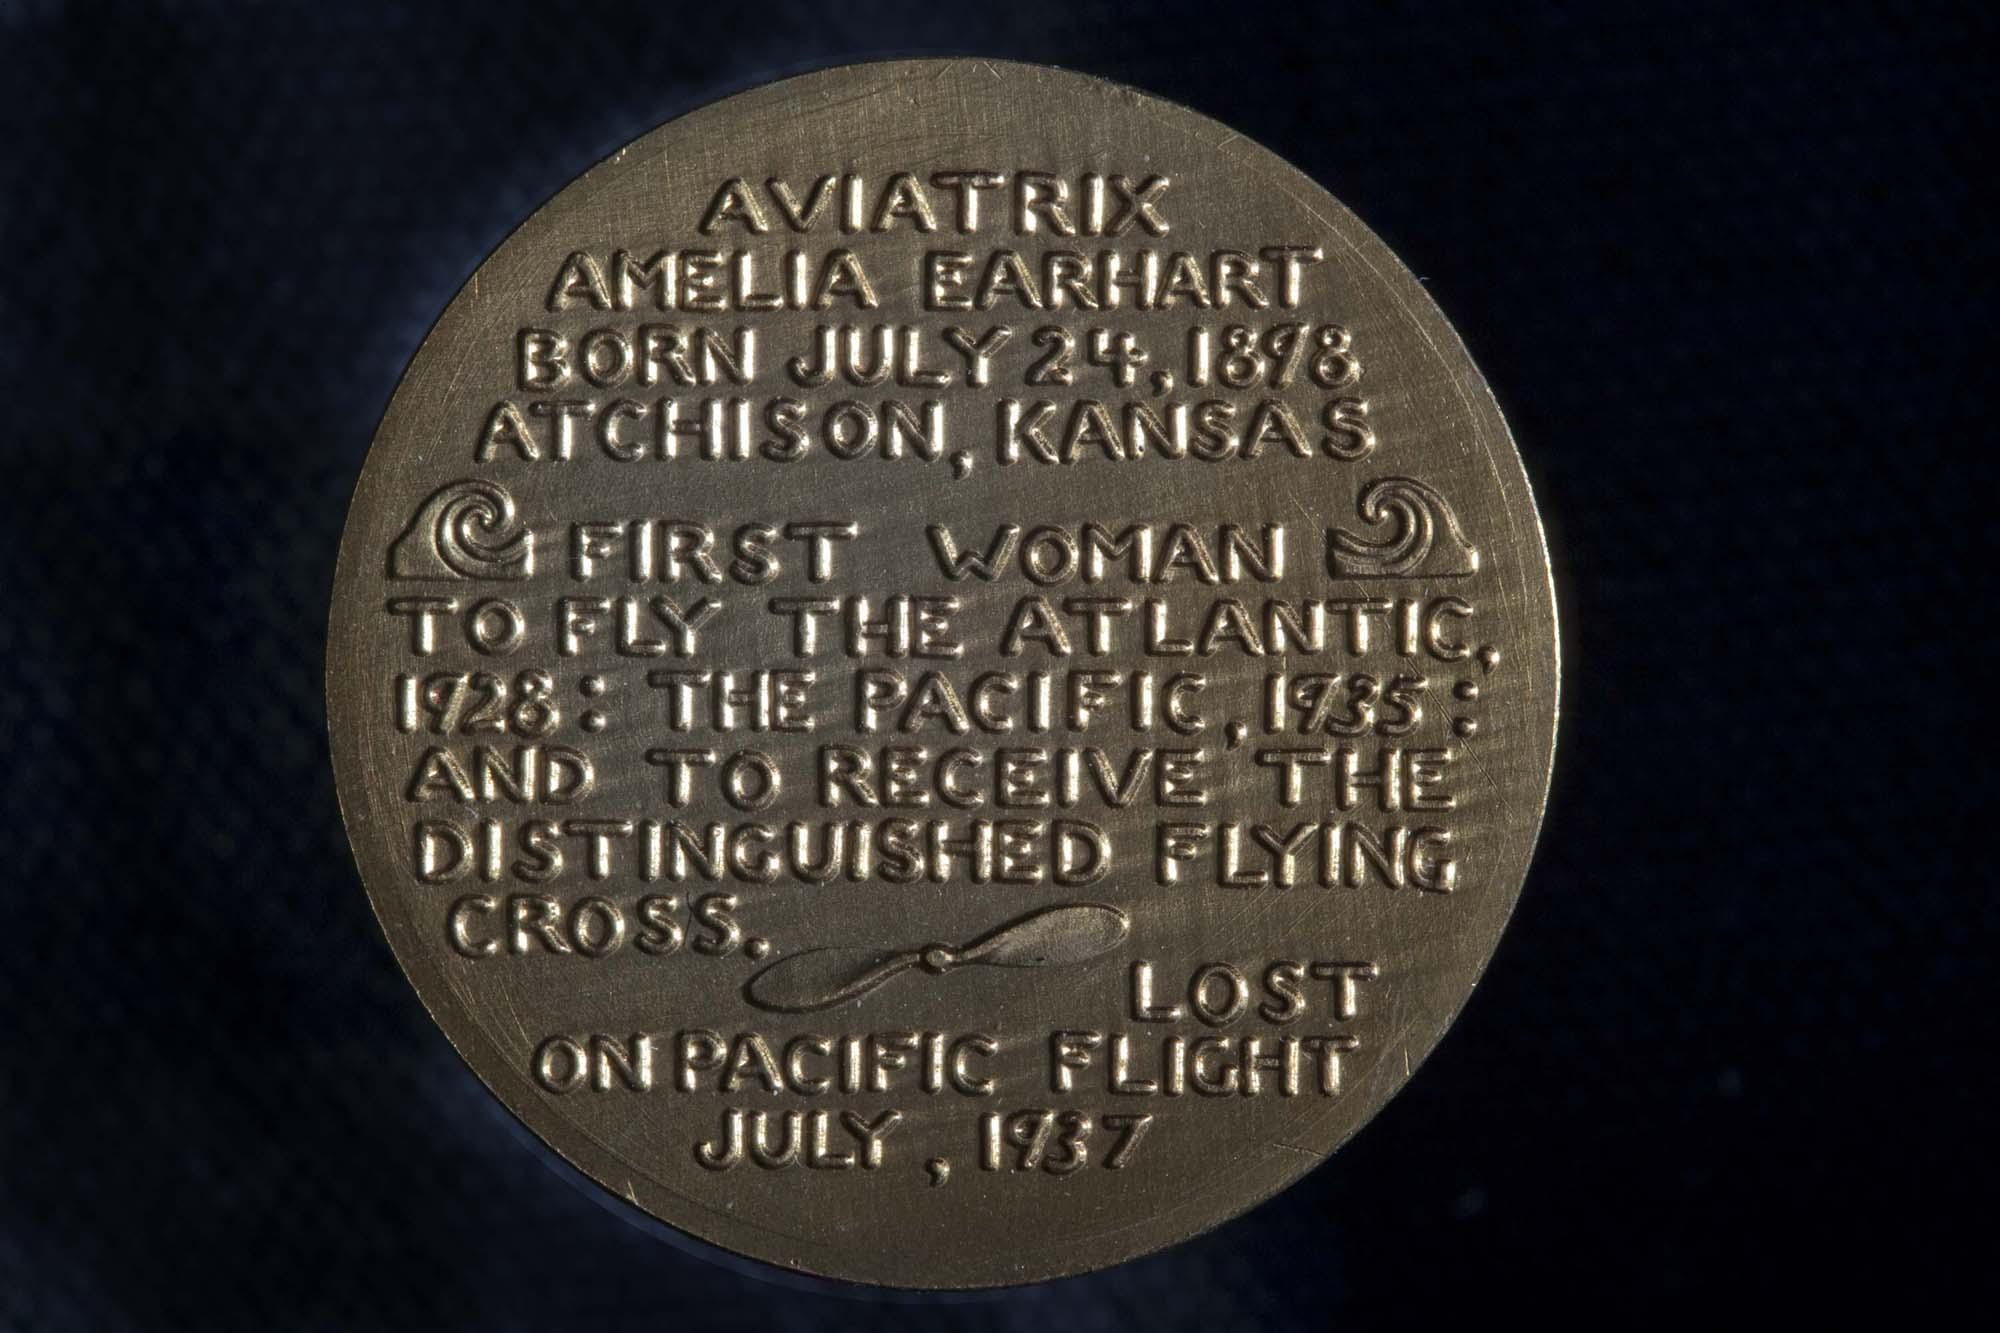 Amelia Earhart Medal (Back)